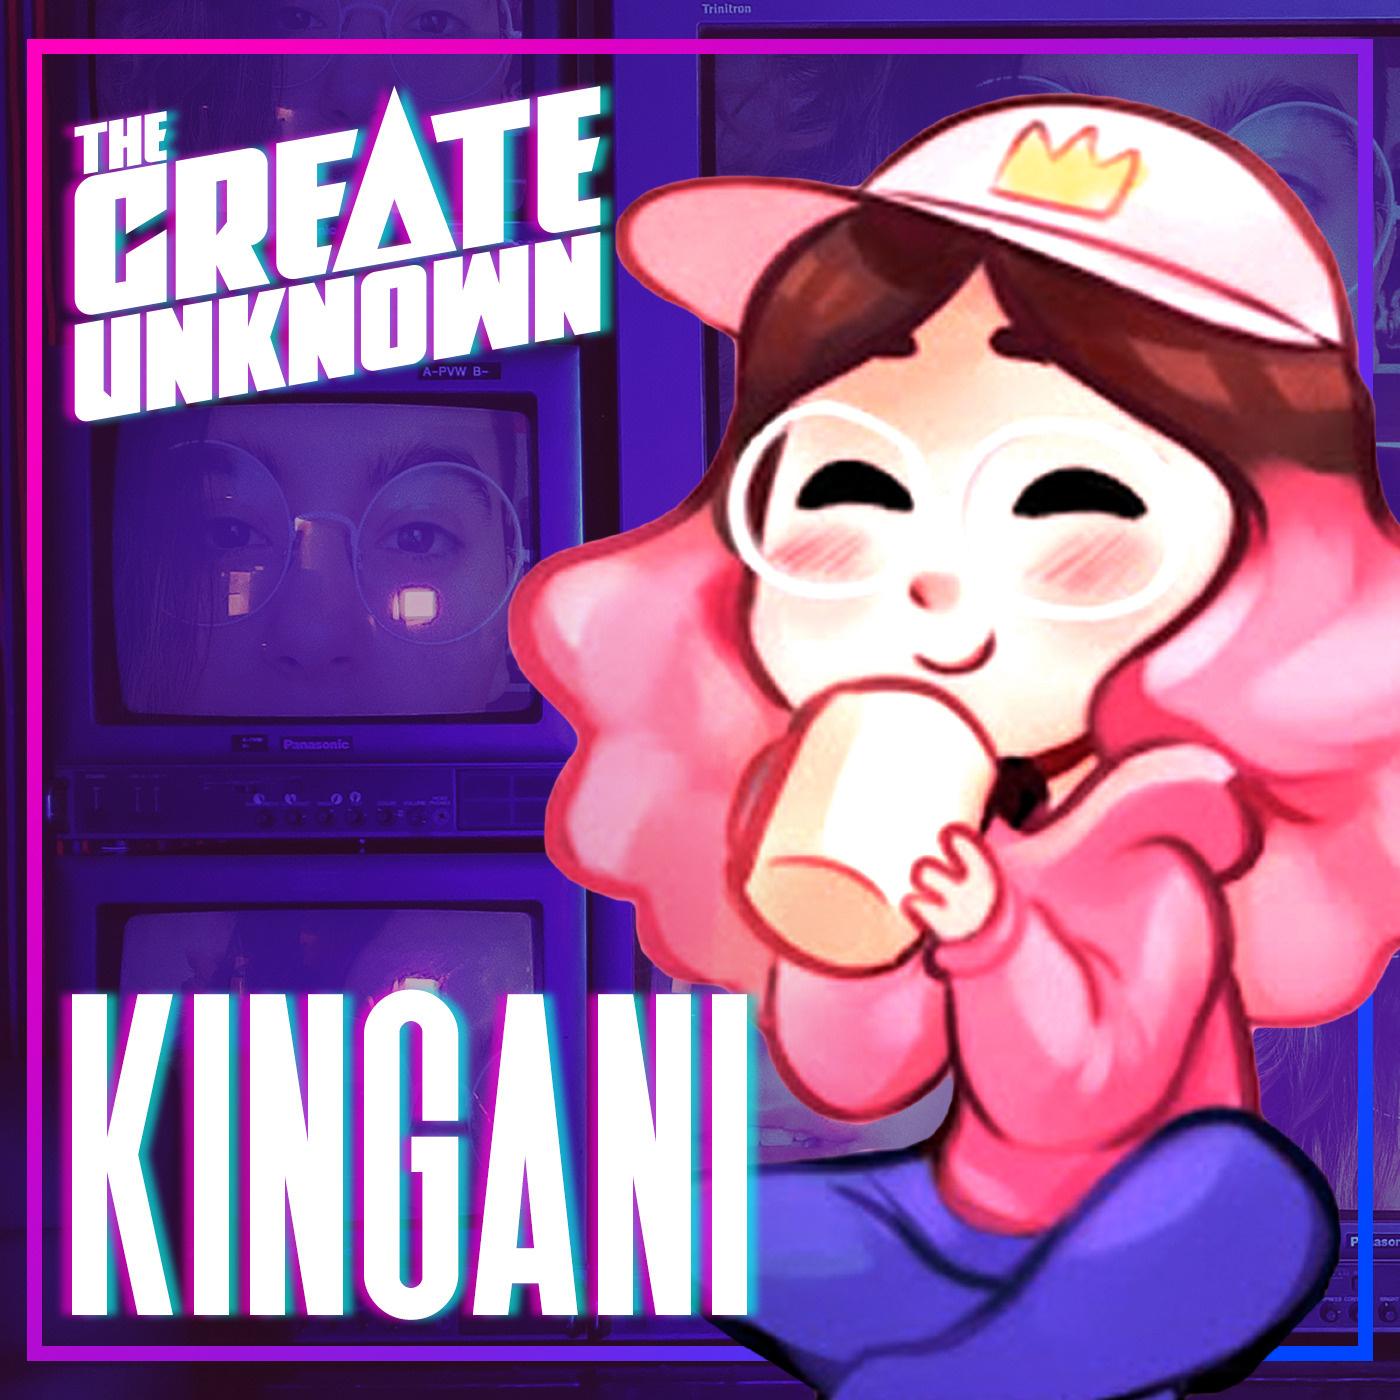 Kingani enters The Create Unknown